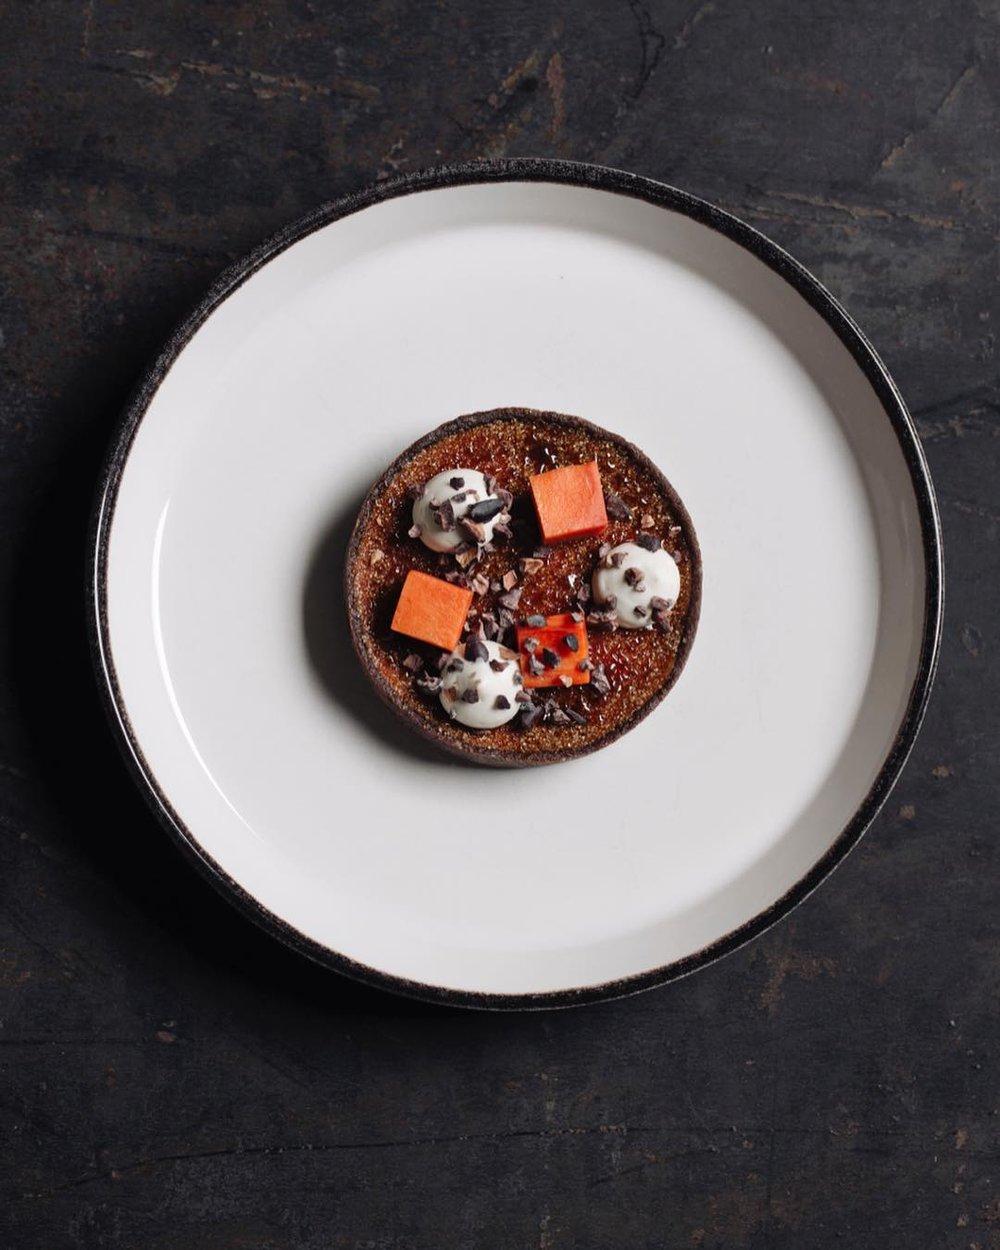 04082018_receta-tarta de creme brulee.jpg